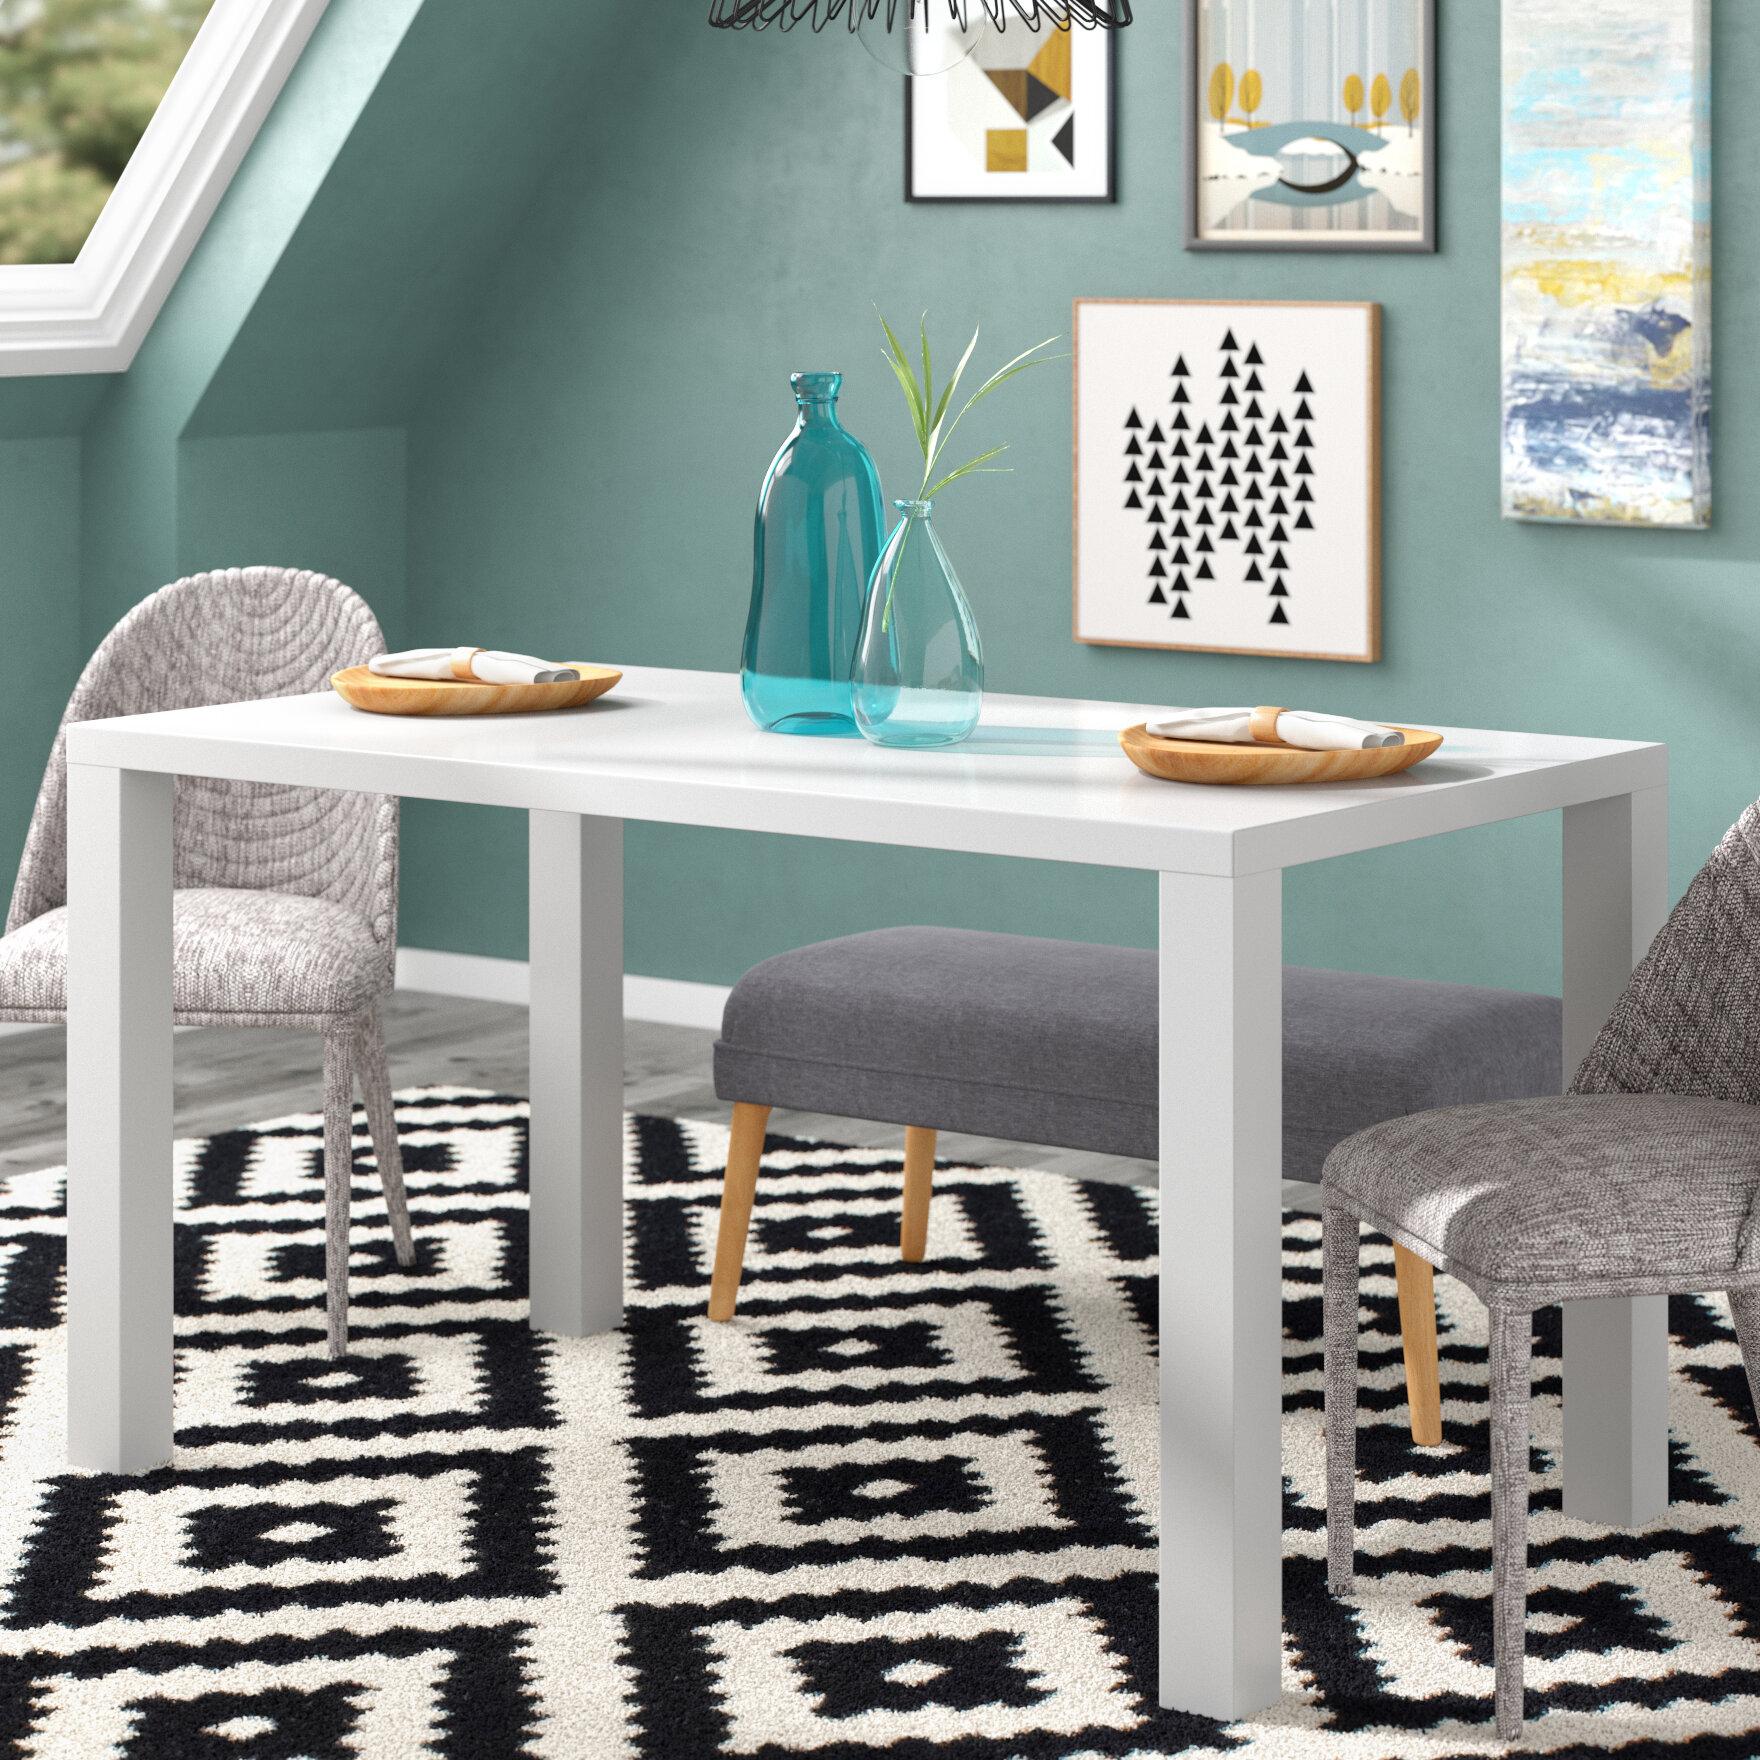 Brayden Studio Mcwhorter Dining Table & Reviews   Wayfair